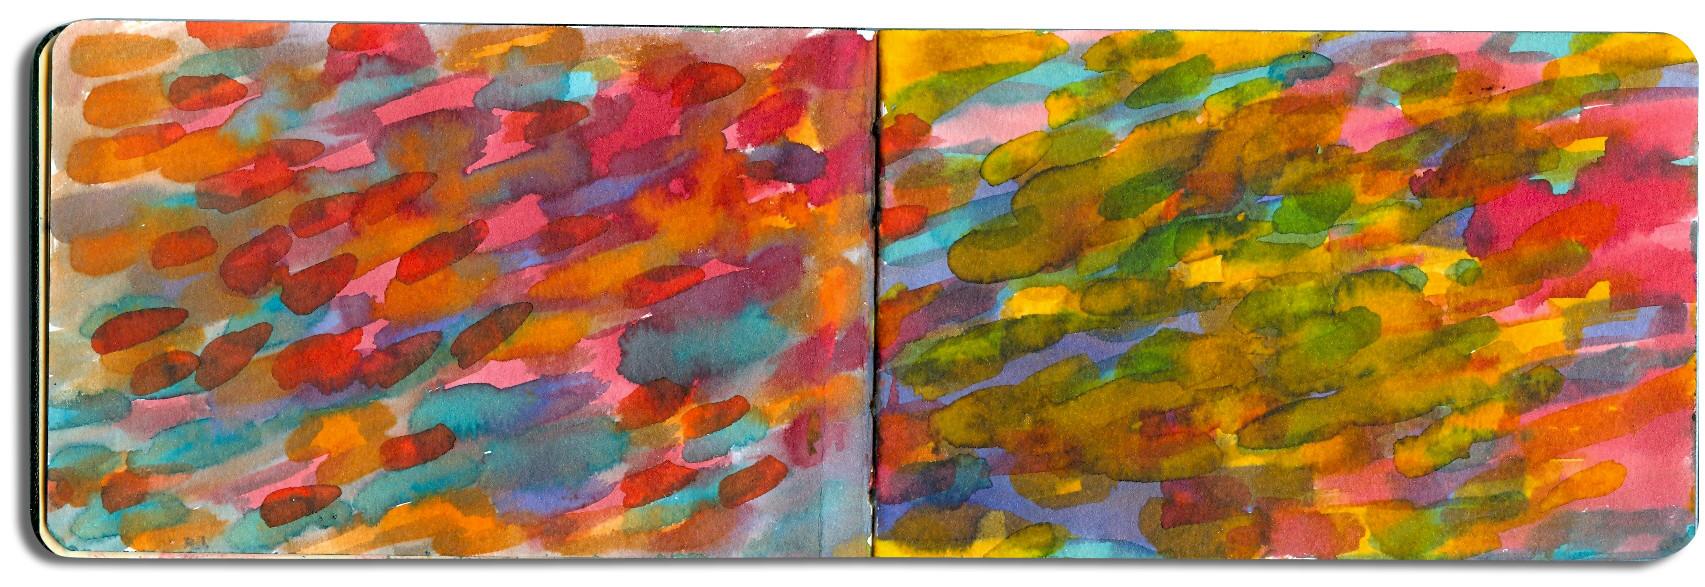 sketchbook small 2011/01